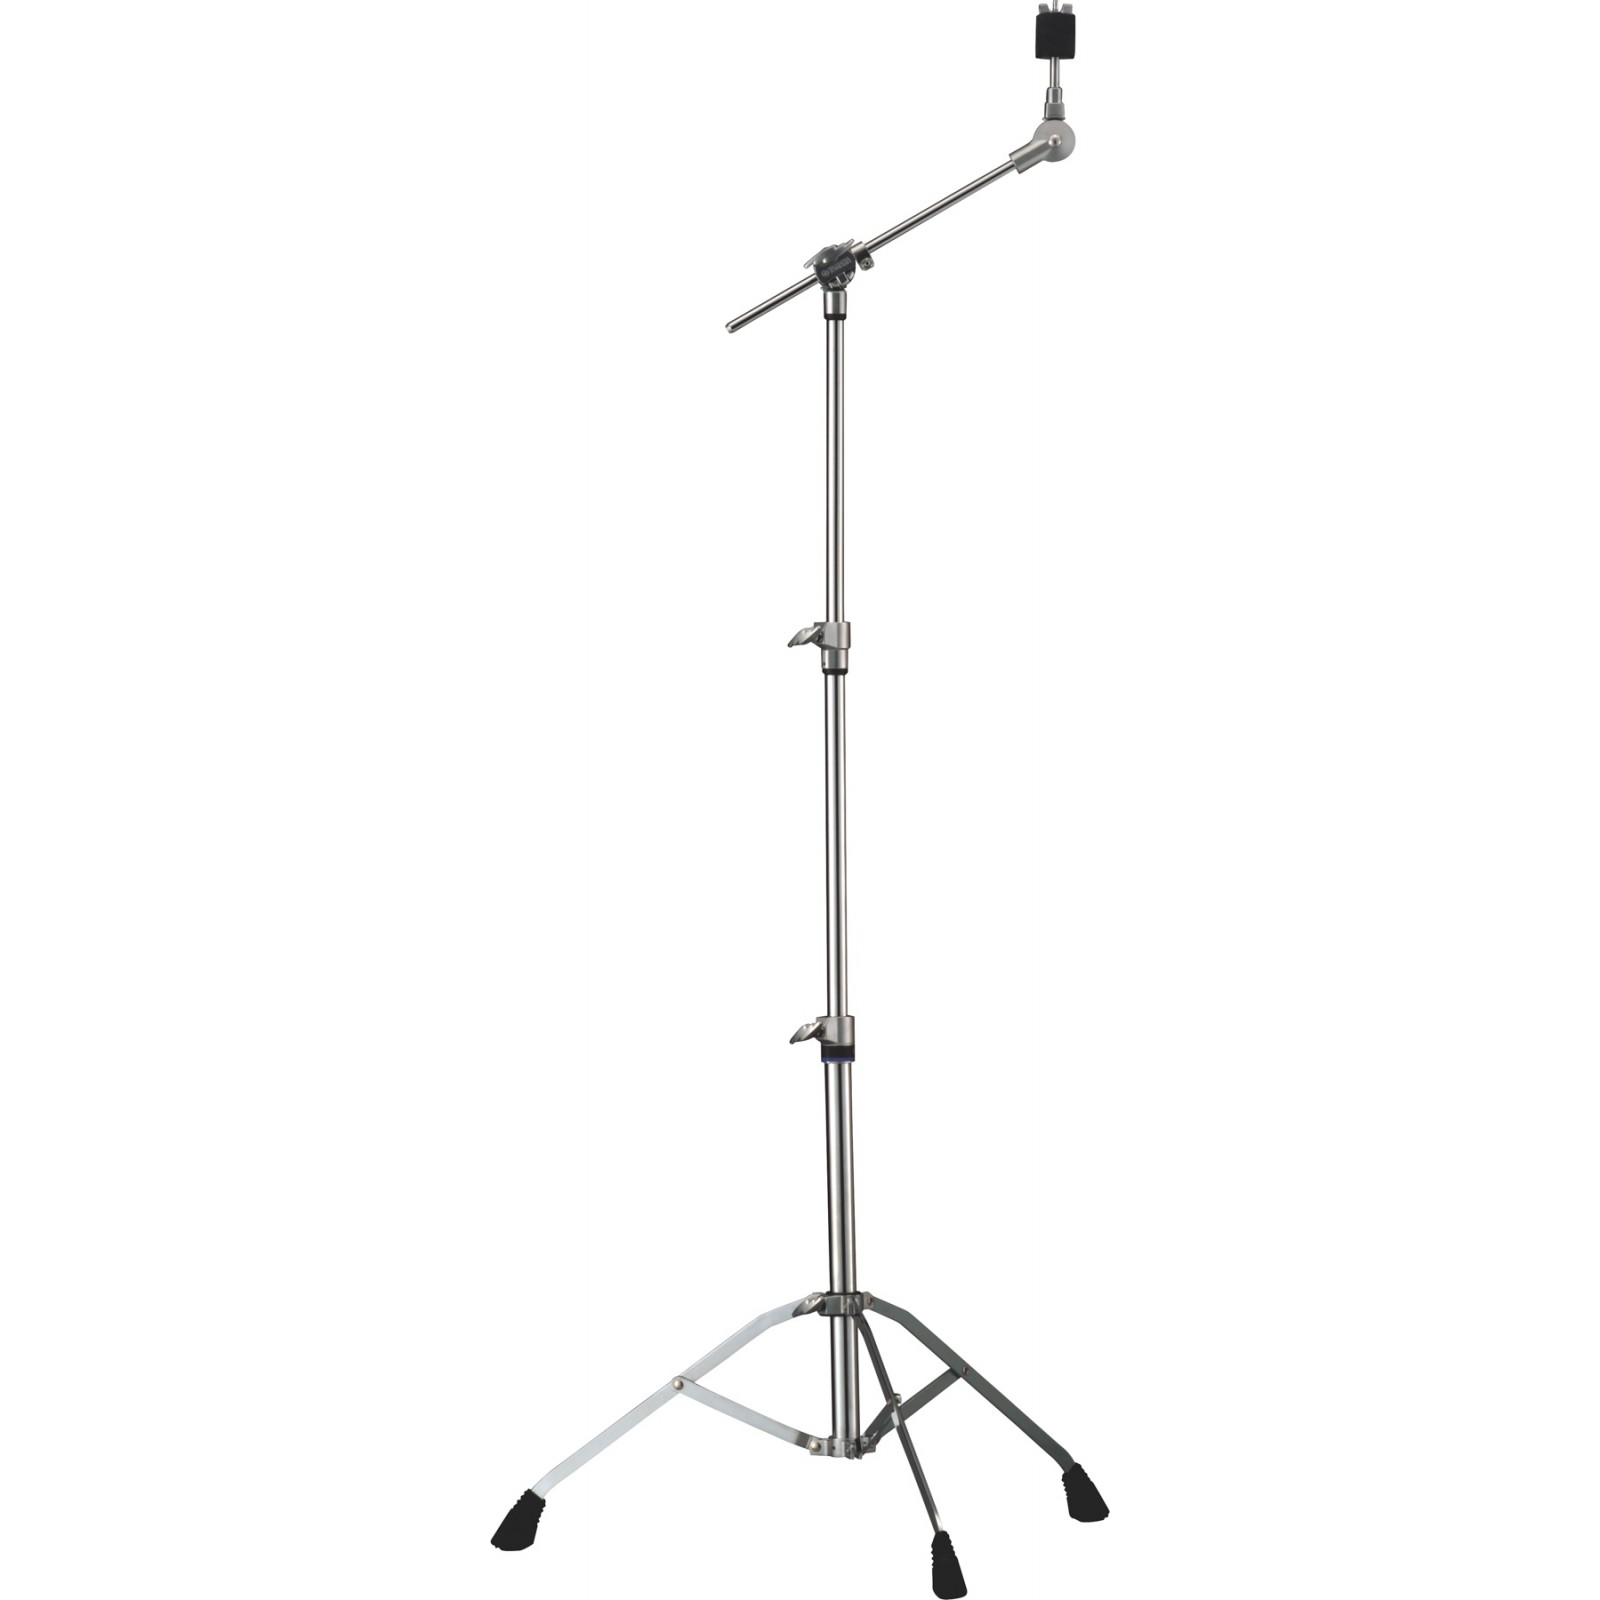 yamaha cs755 cymbal boom stand. Black Bedroom Furniture Sets. Home Design Ideas